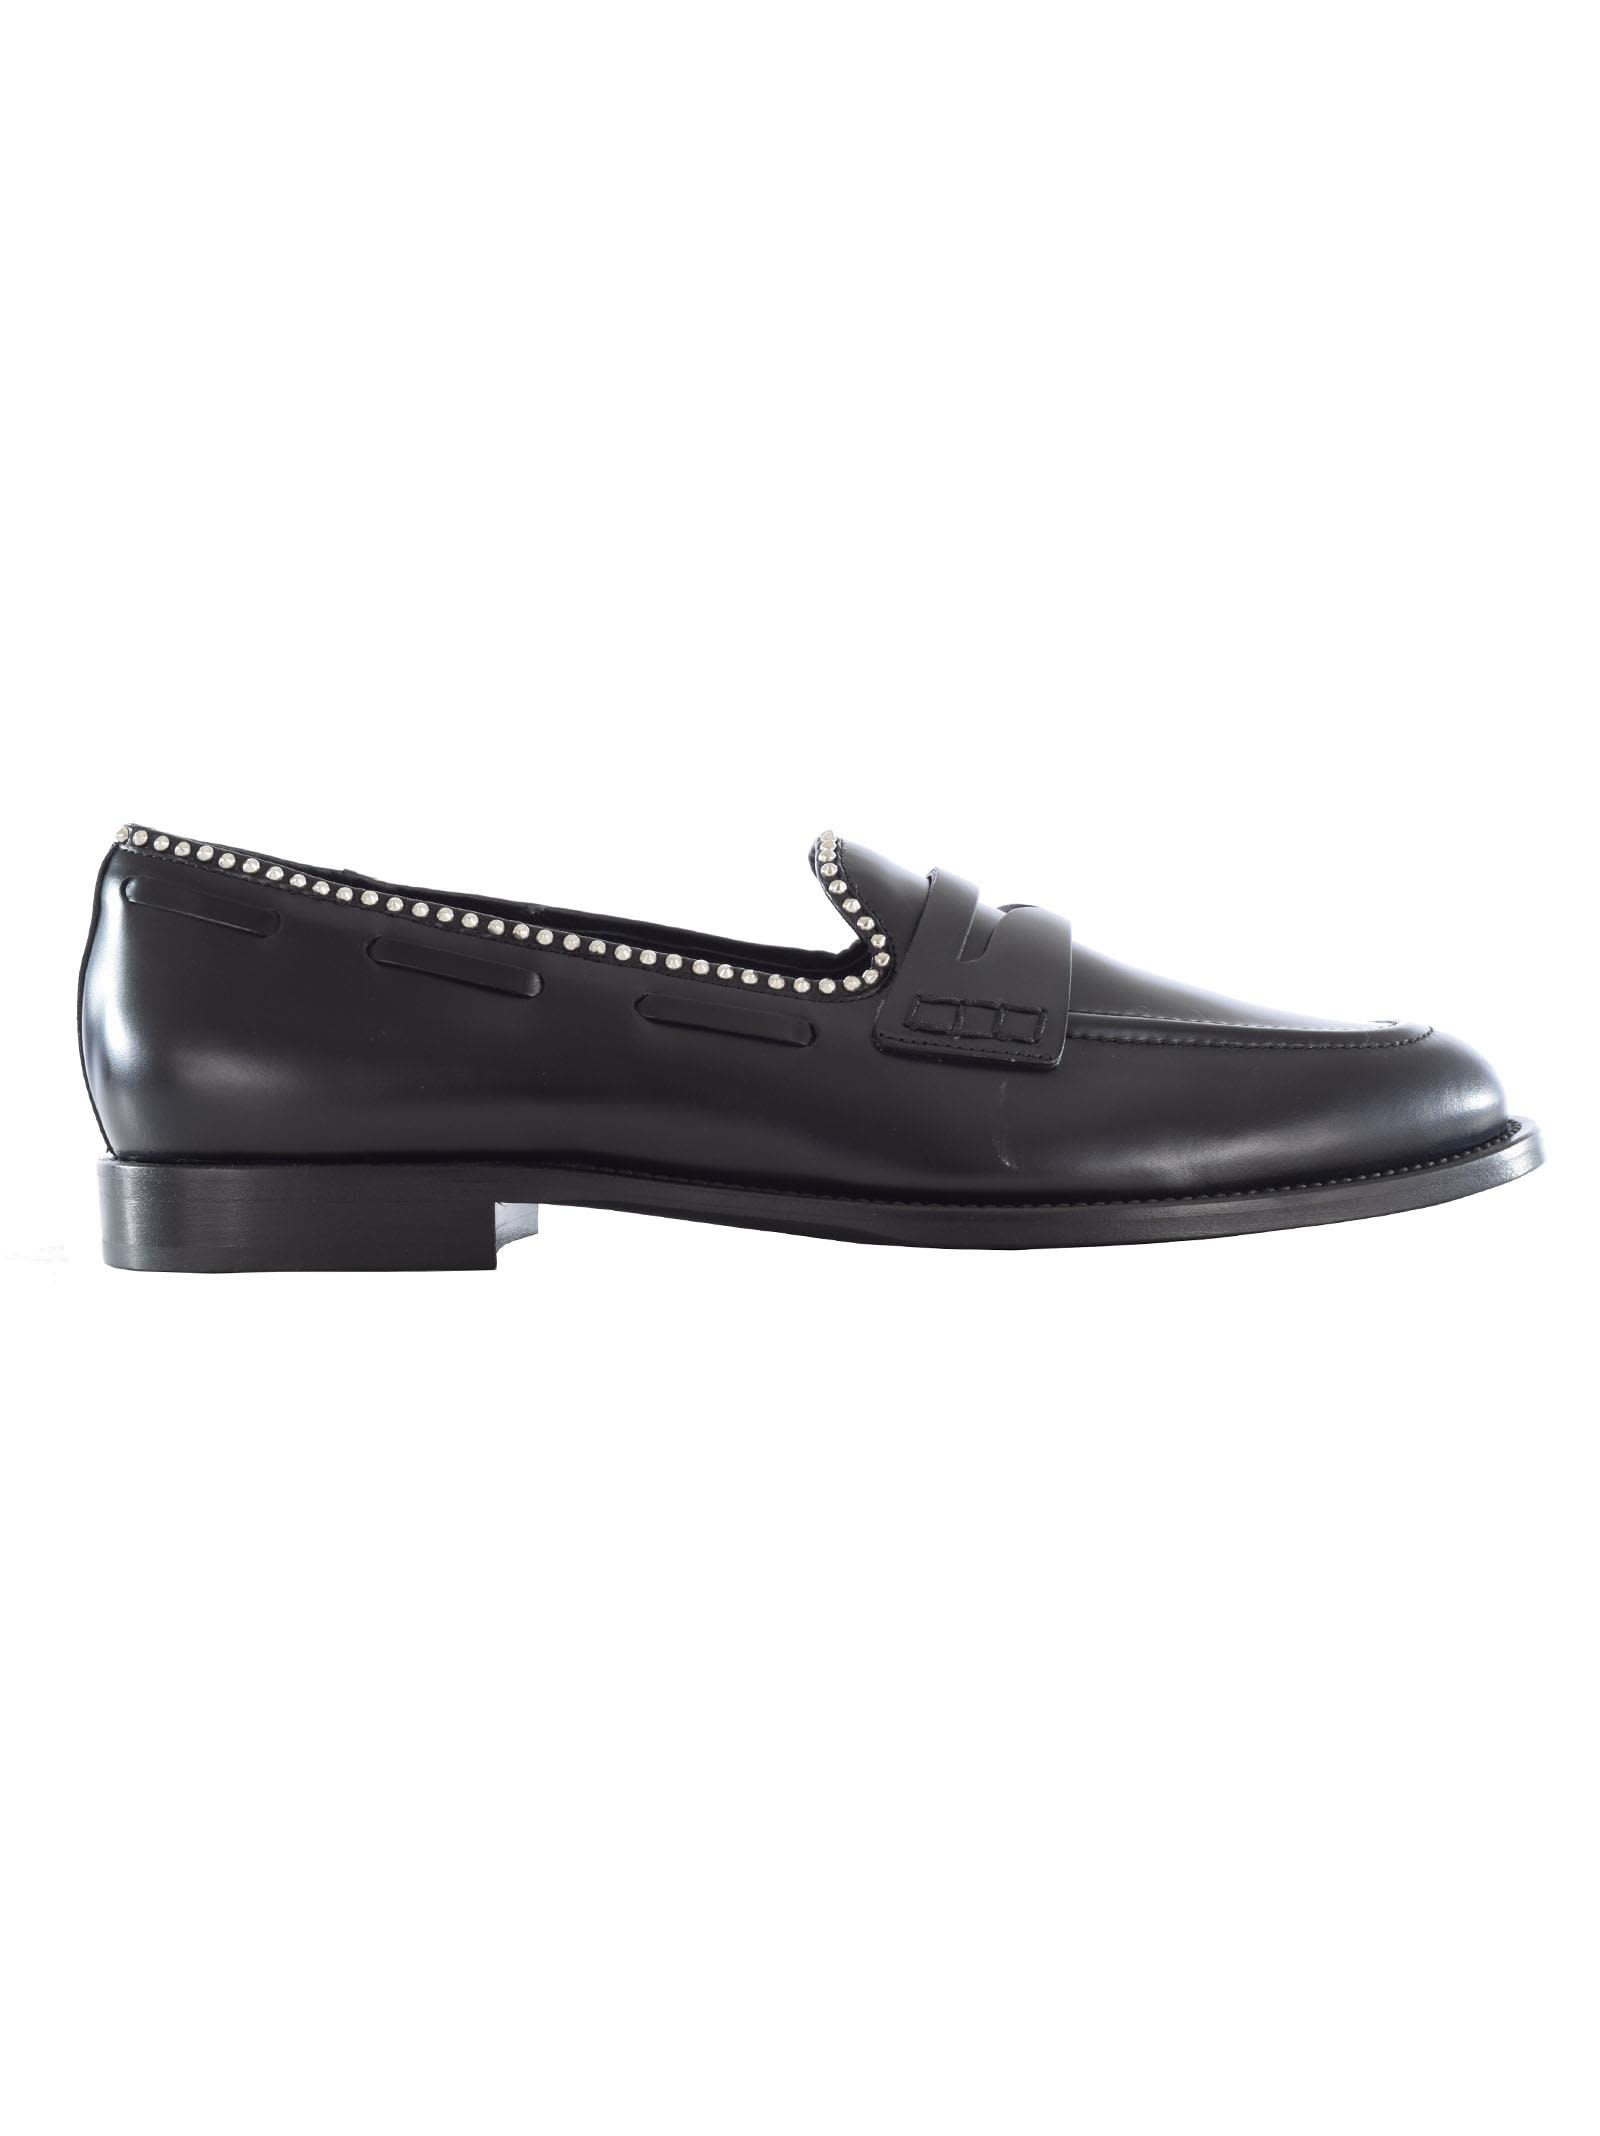 Giuseppe Zanotti Micro Stud Loafers